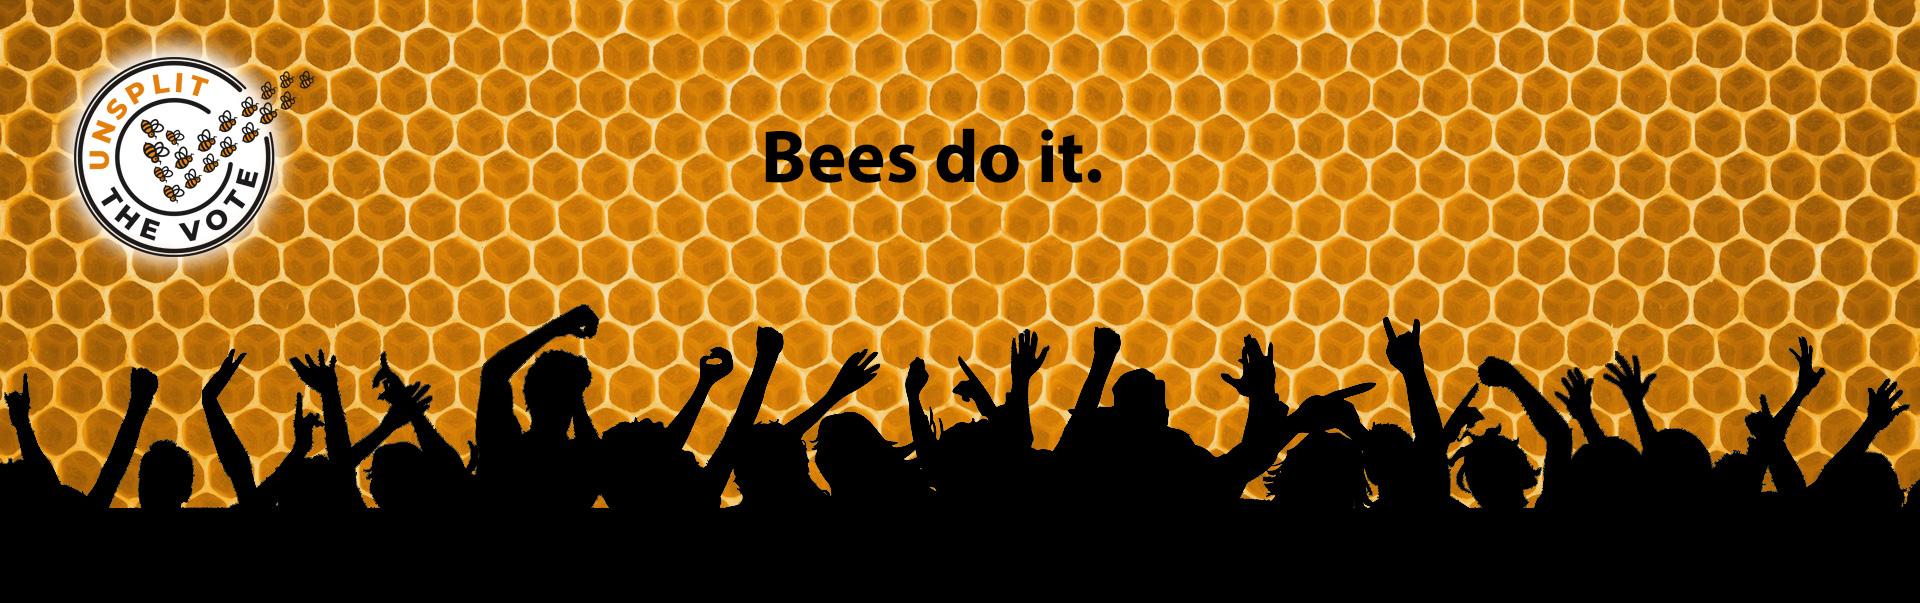 Image: honeycomb_rave_text_logo